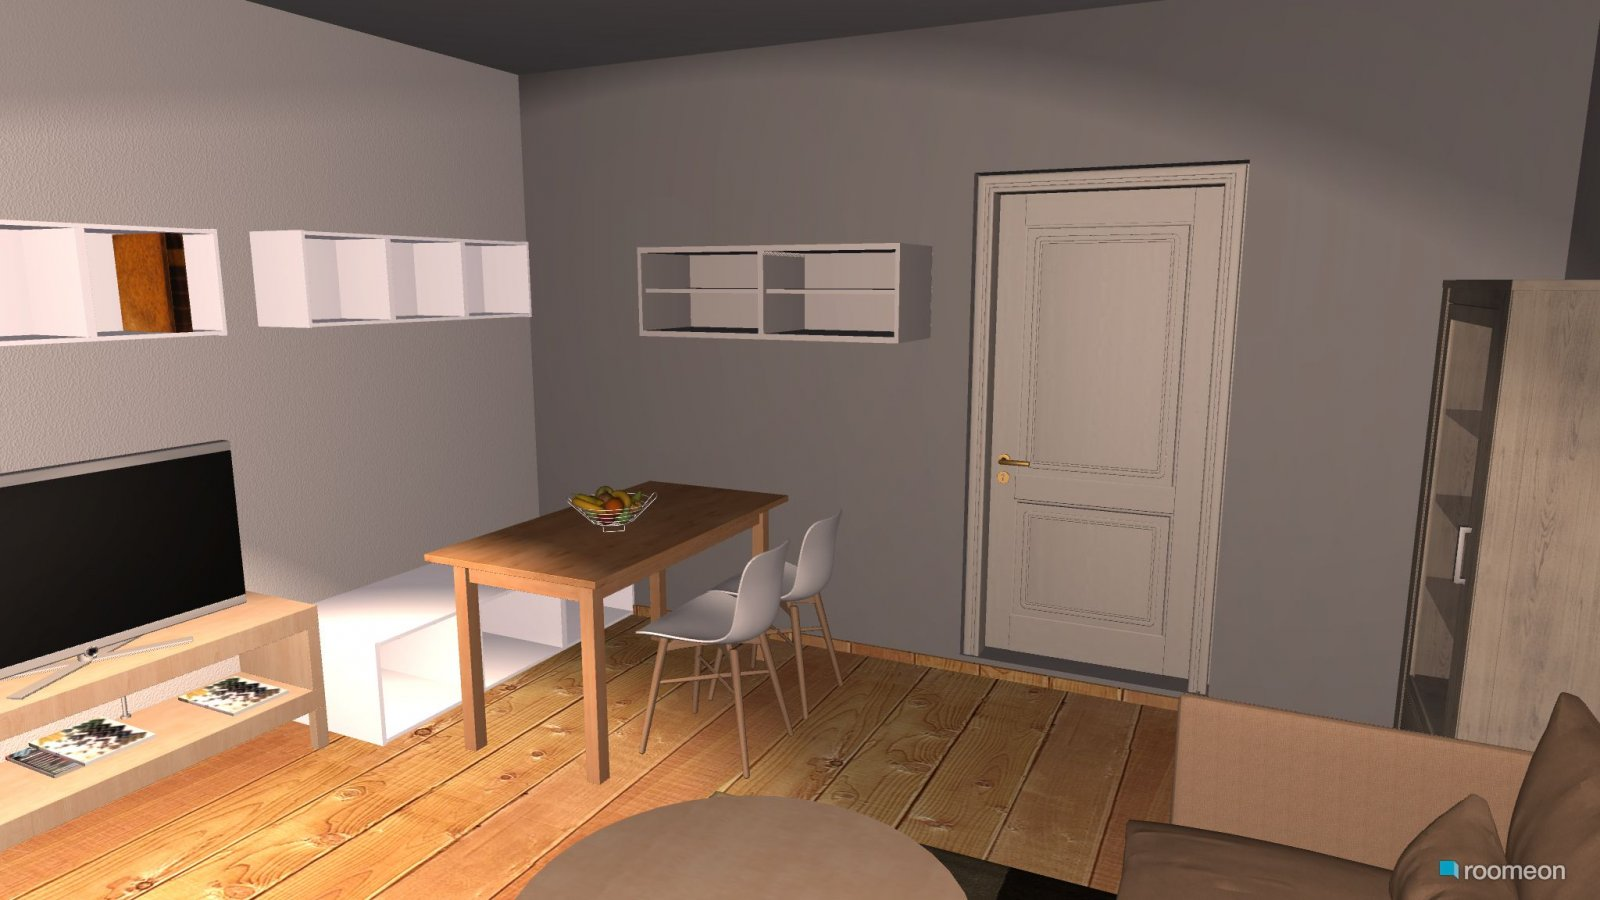 Raumplanung Wohnzimmer Grosses Sofa 3 Roomeon Community